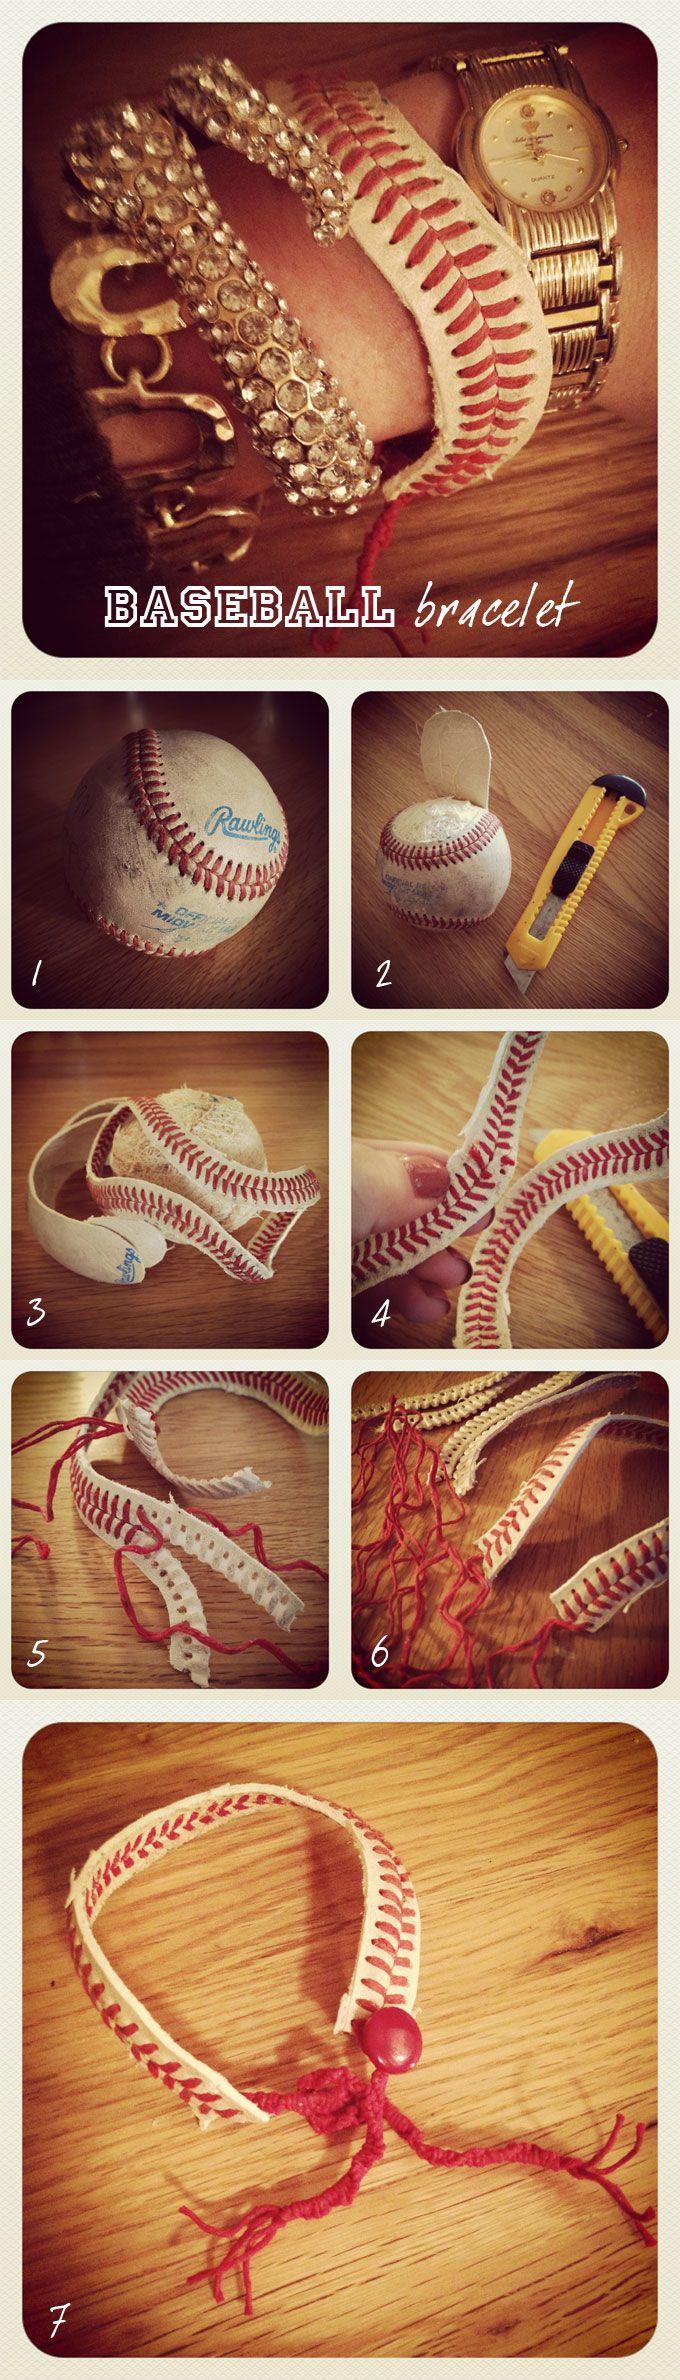 Baseball bracelets!  :)